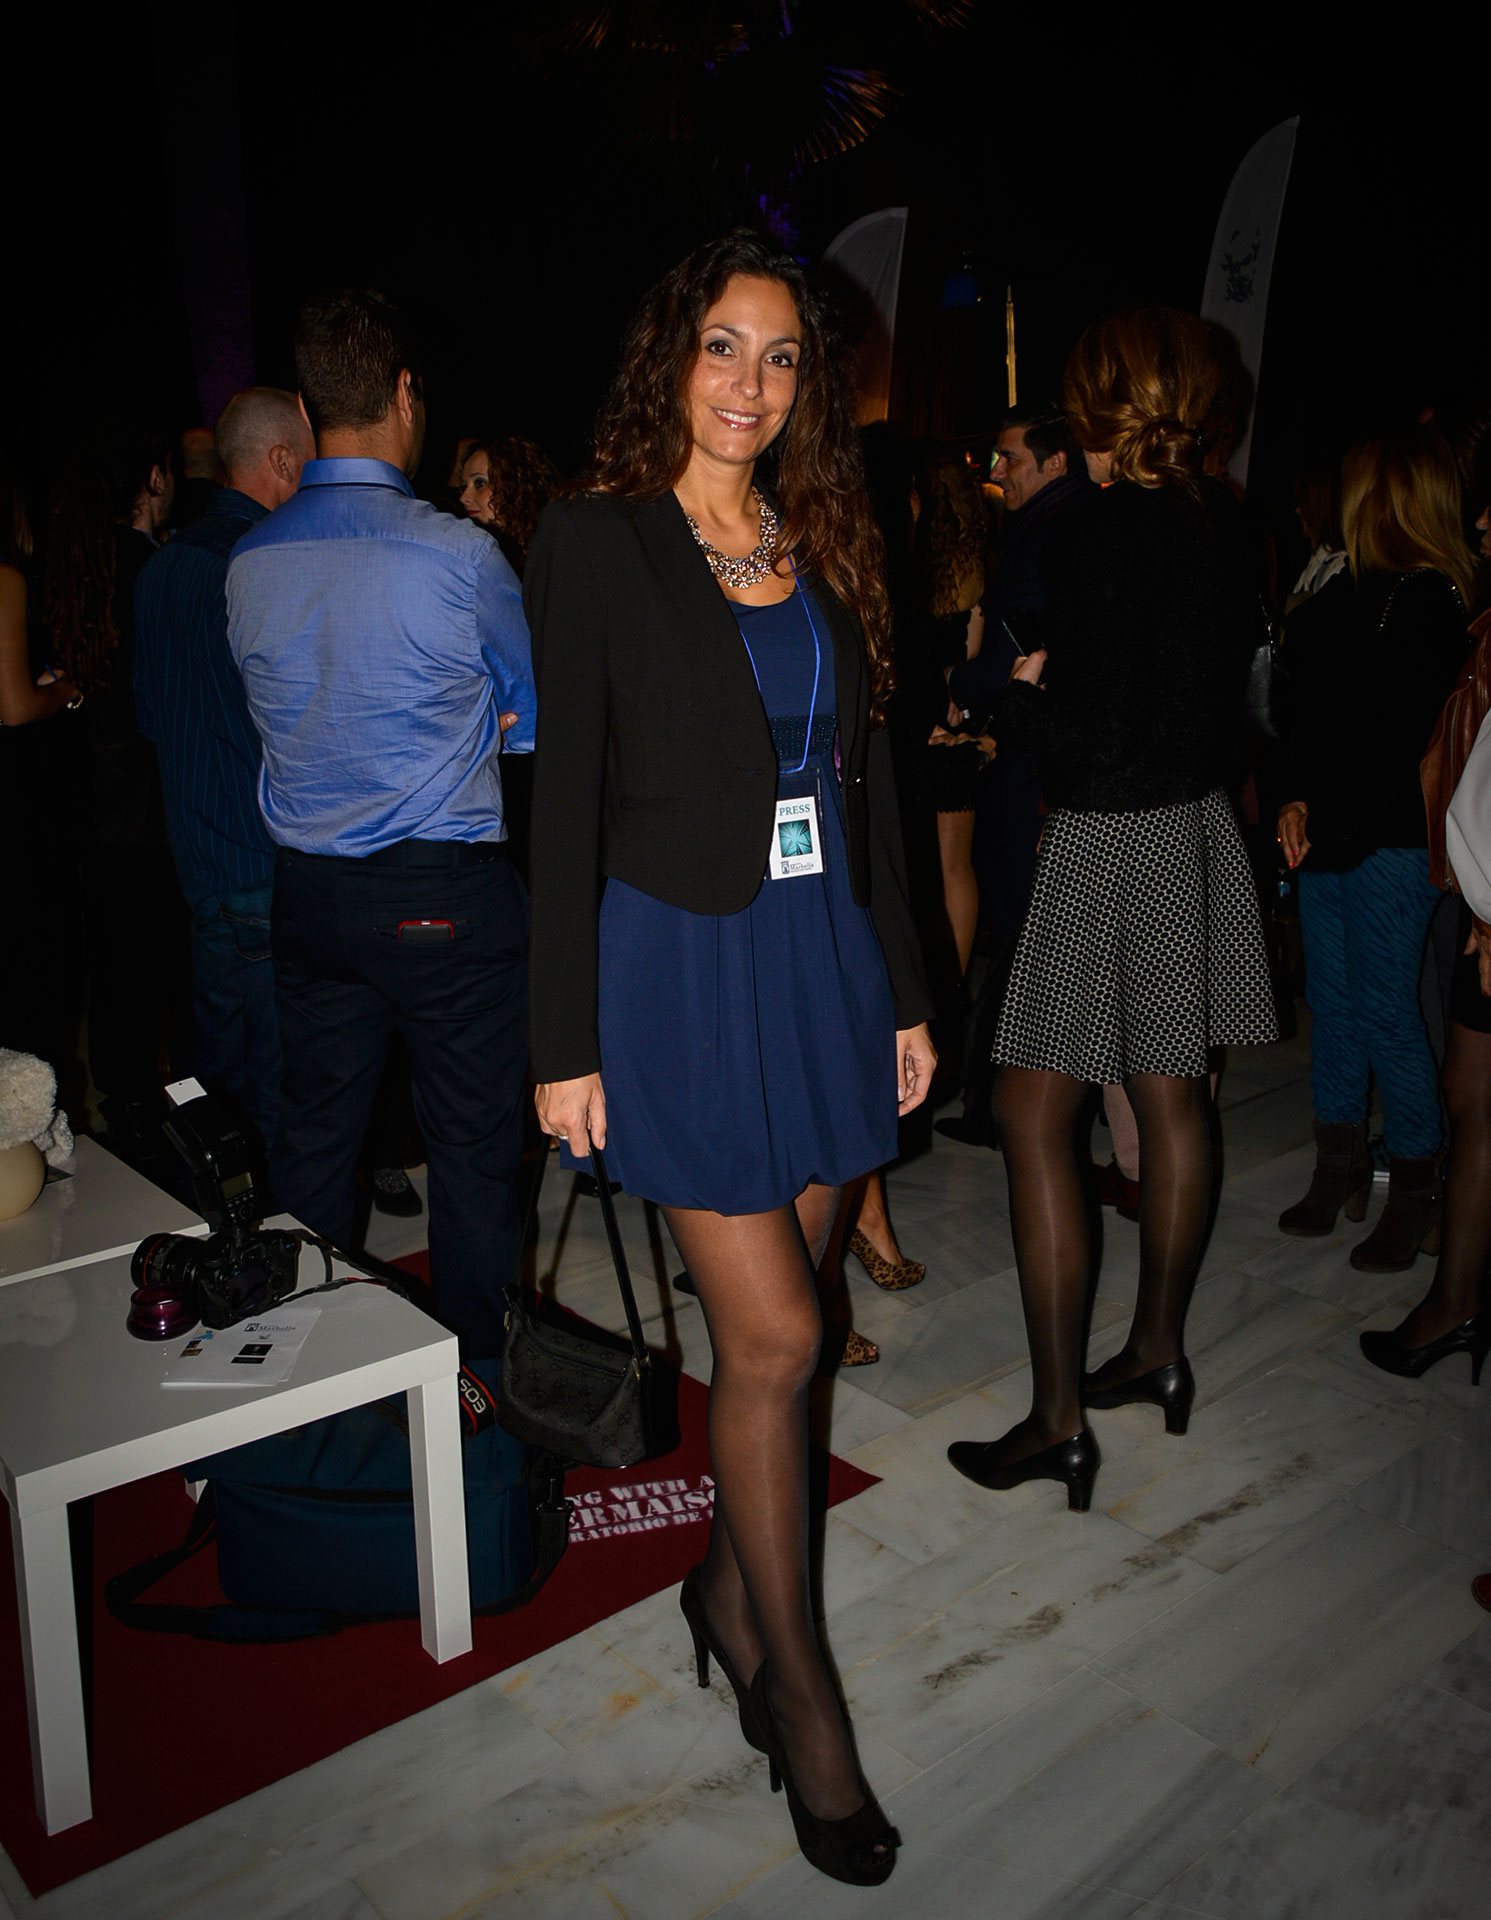 Ariana Soffici en la Gala y Entrega de Premios I Filmamaker International Film Festival Marbella www.arianasoffici.com